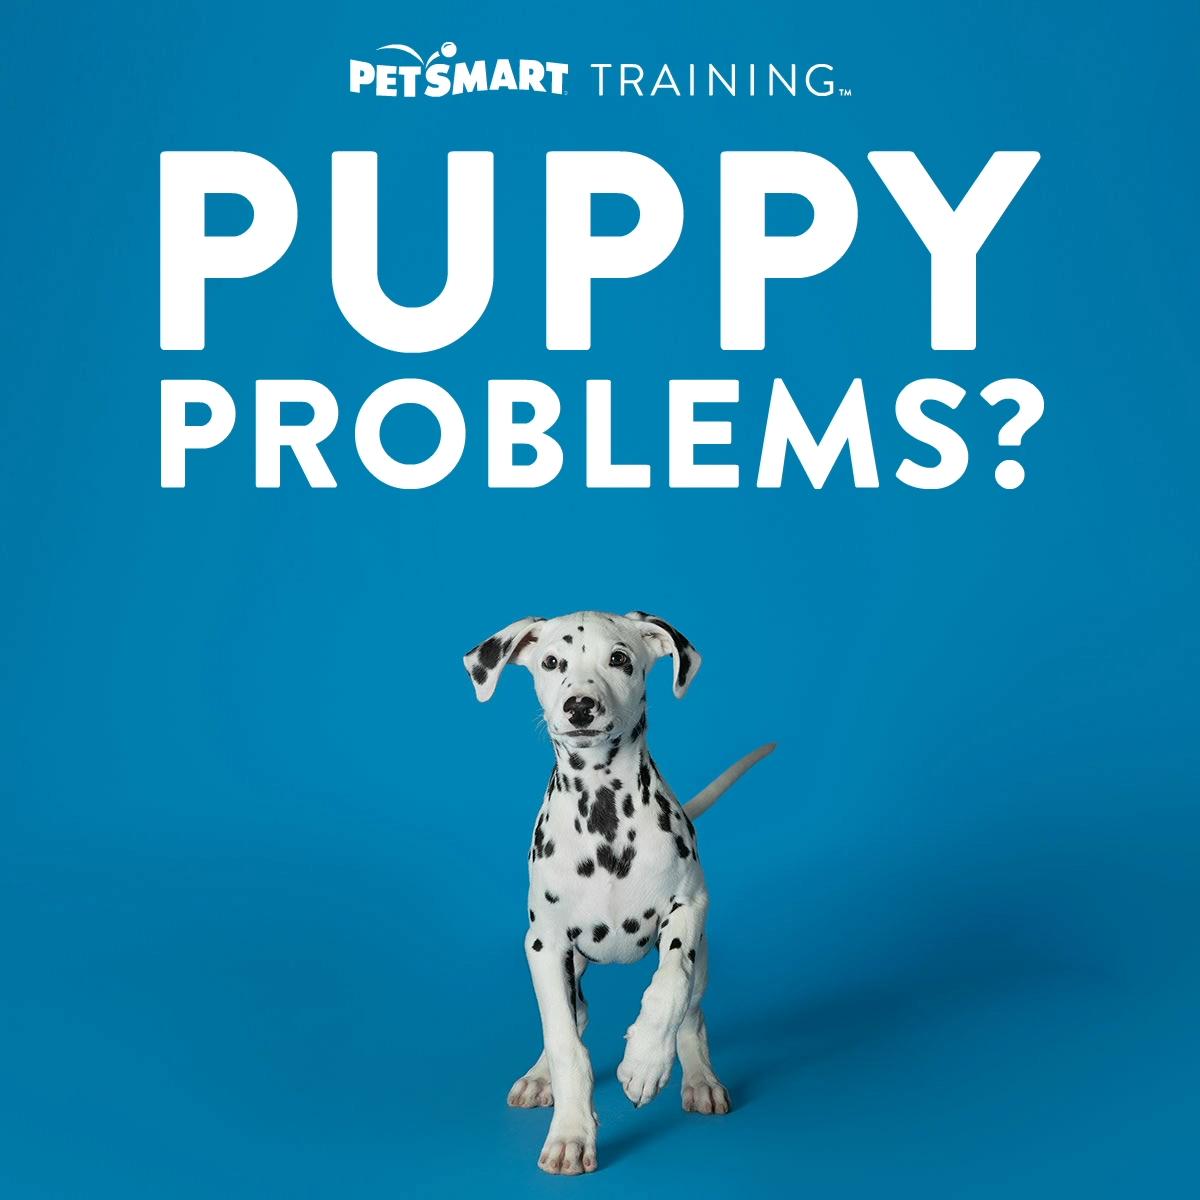 Petsmart Training Video Cat Breeds Dogs Pets Online